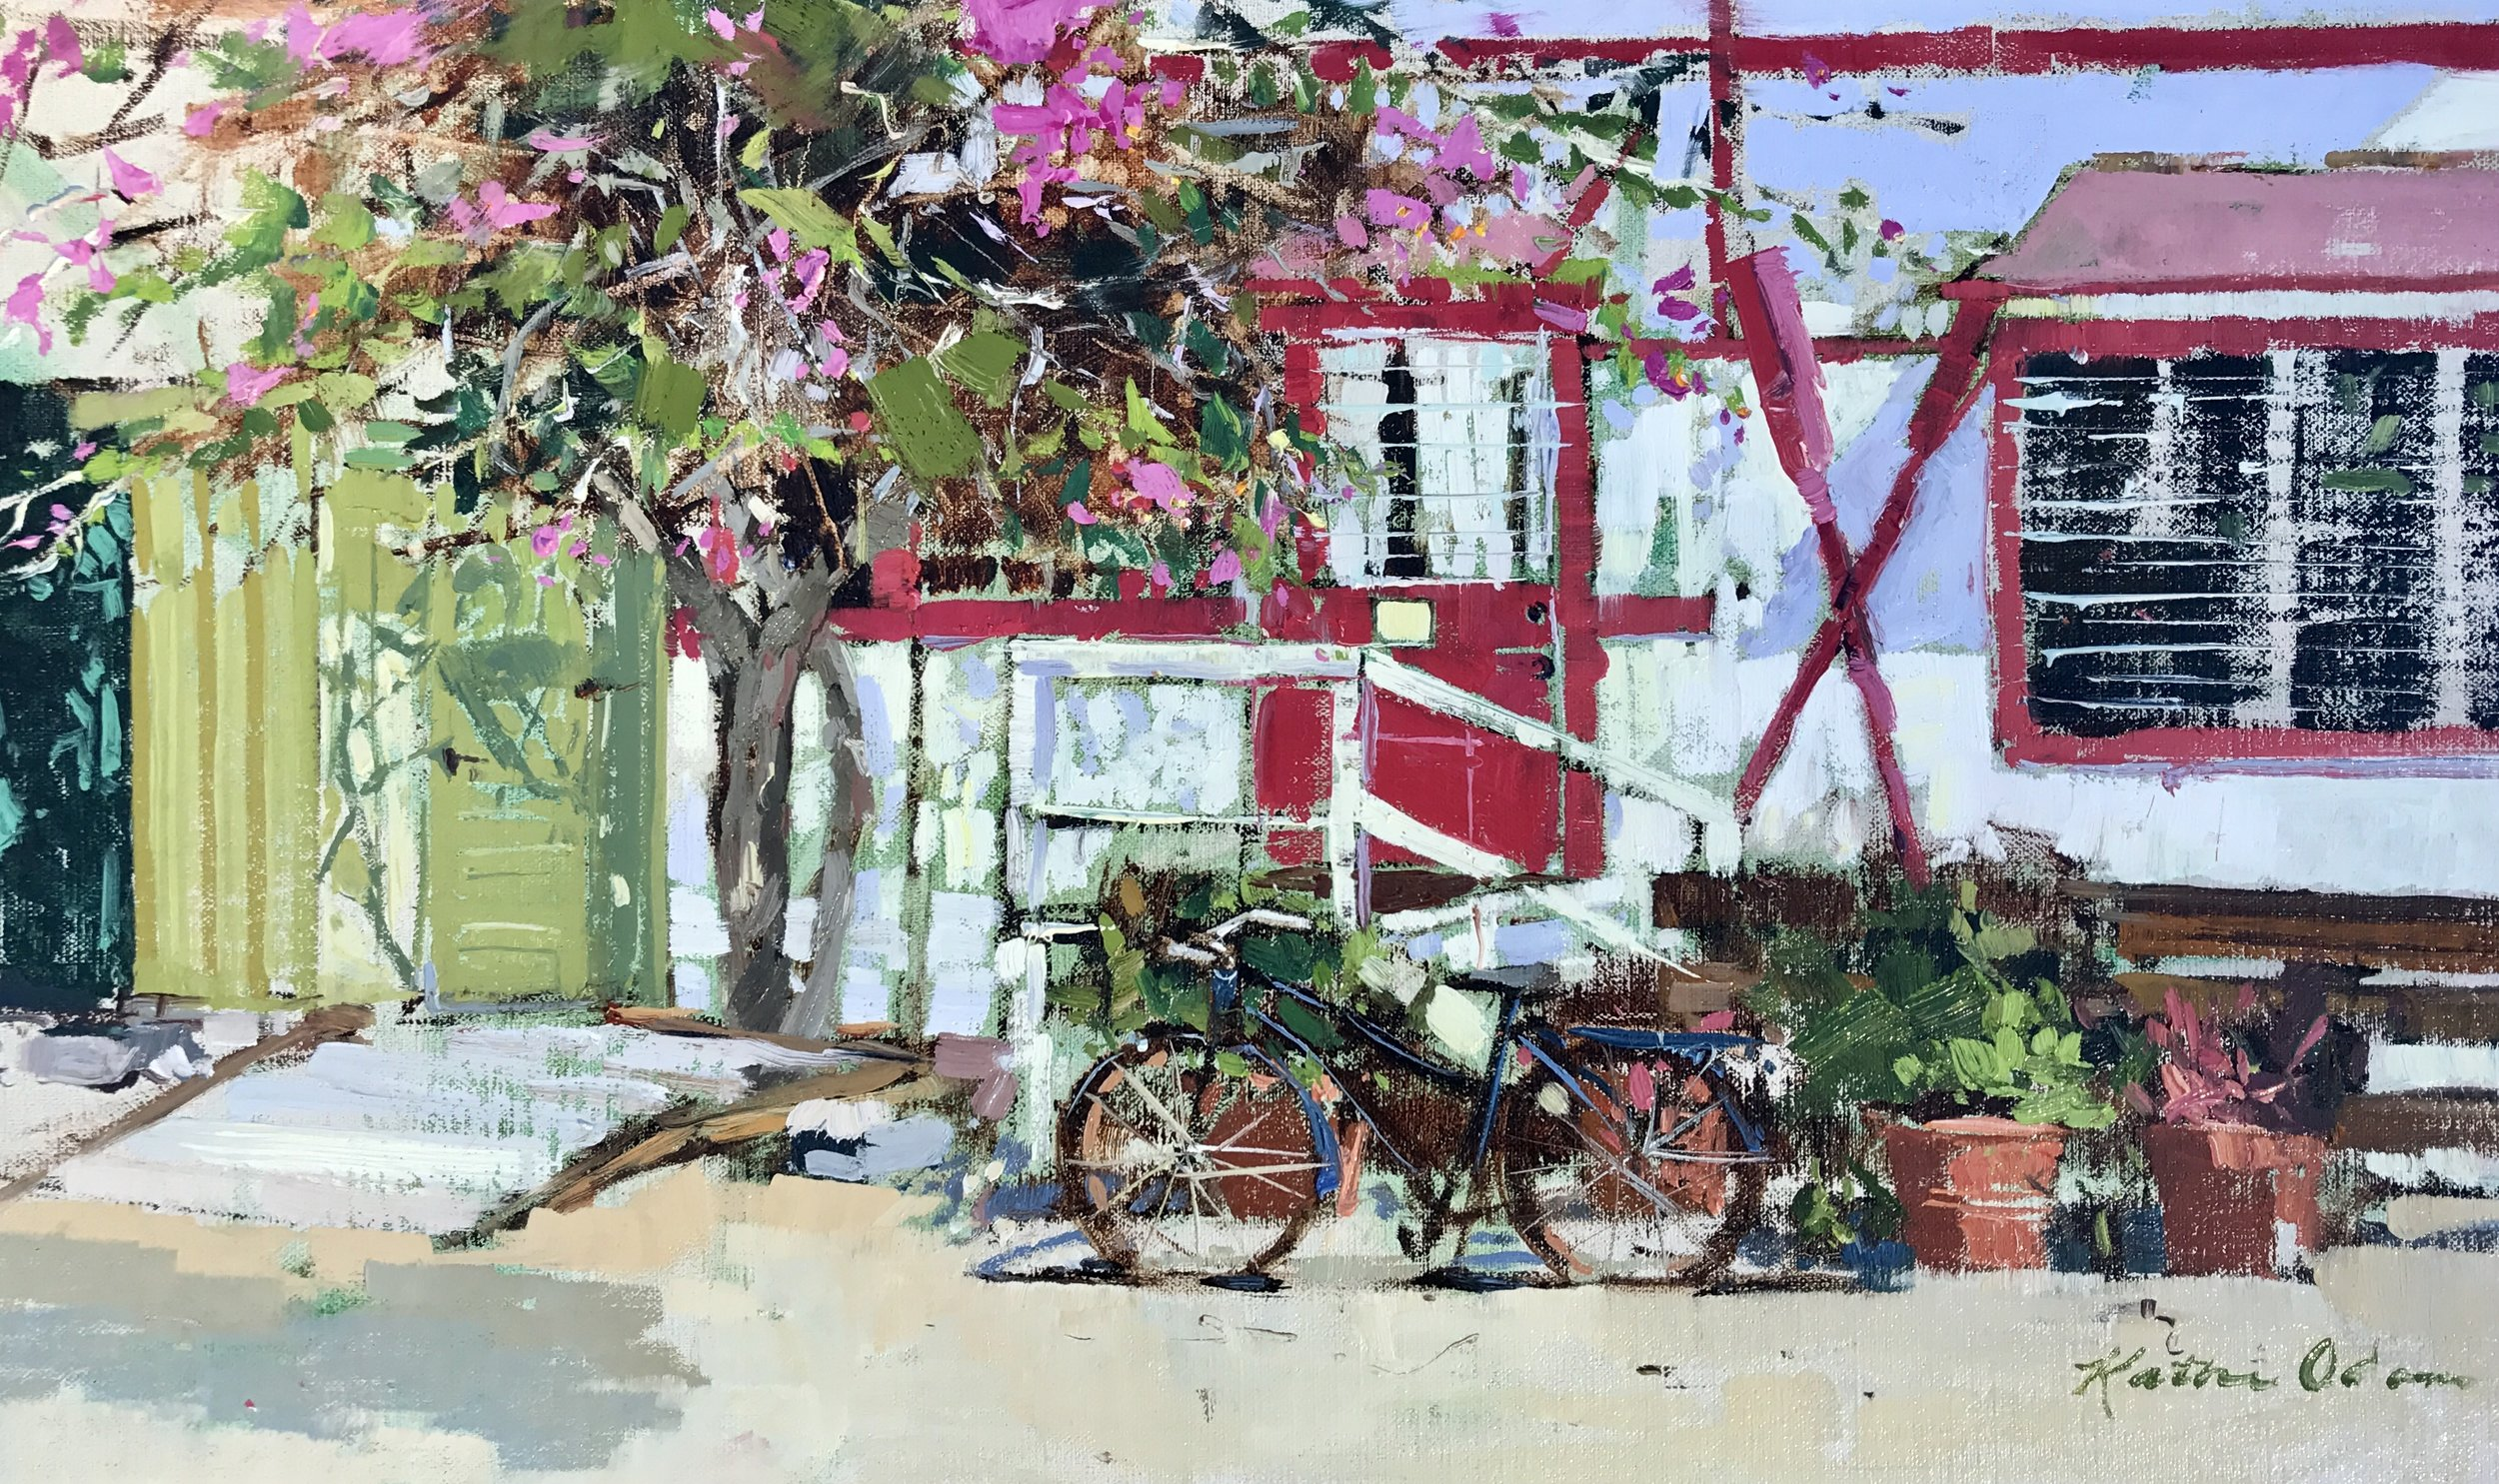 Kathie Odom, Joy Ride